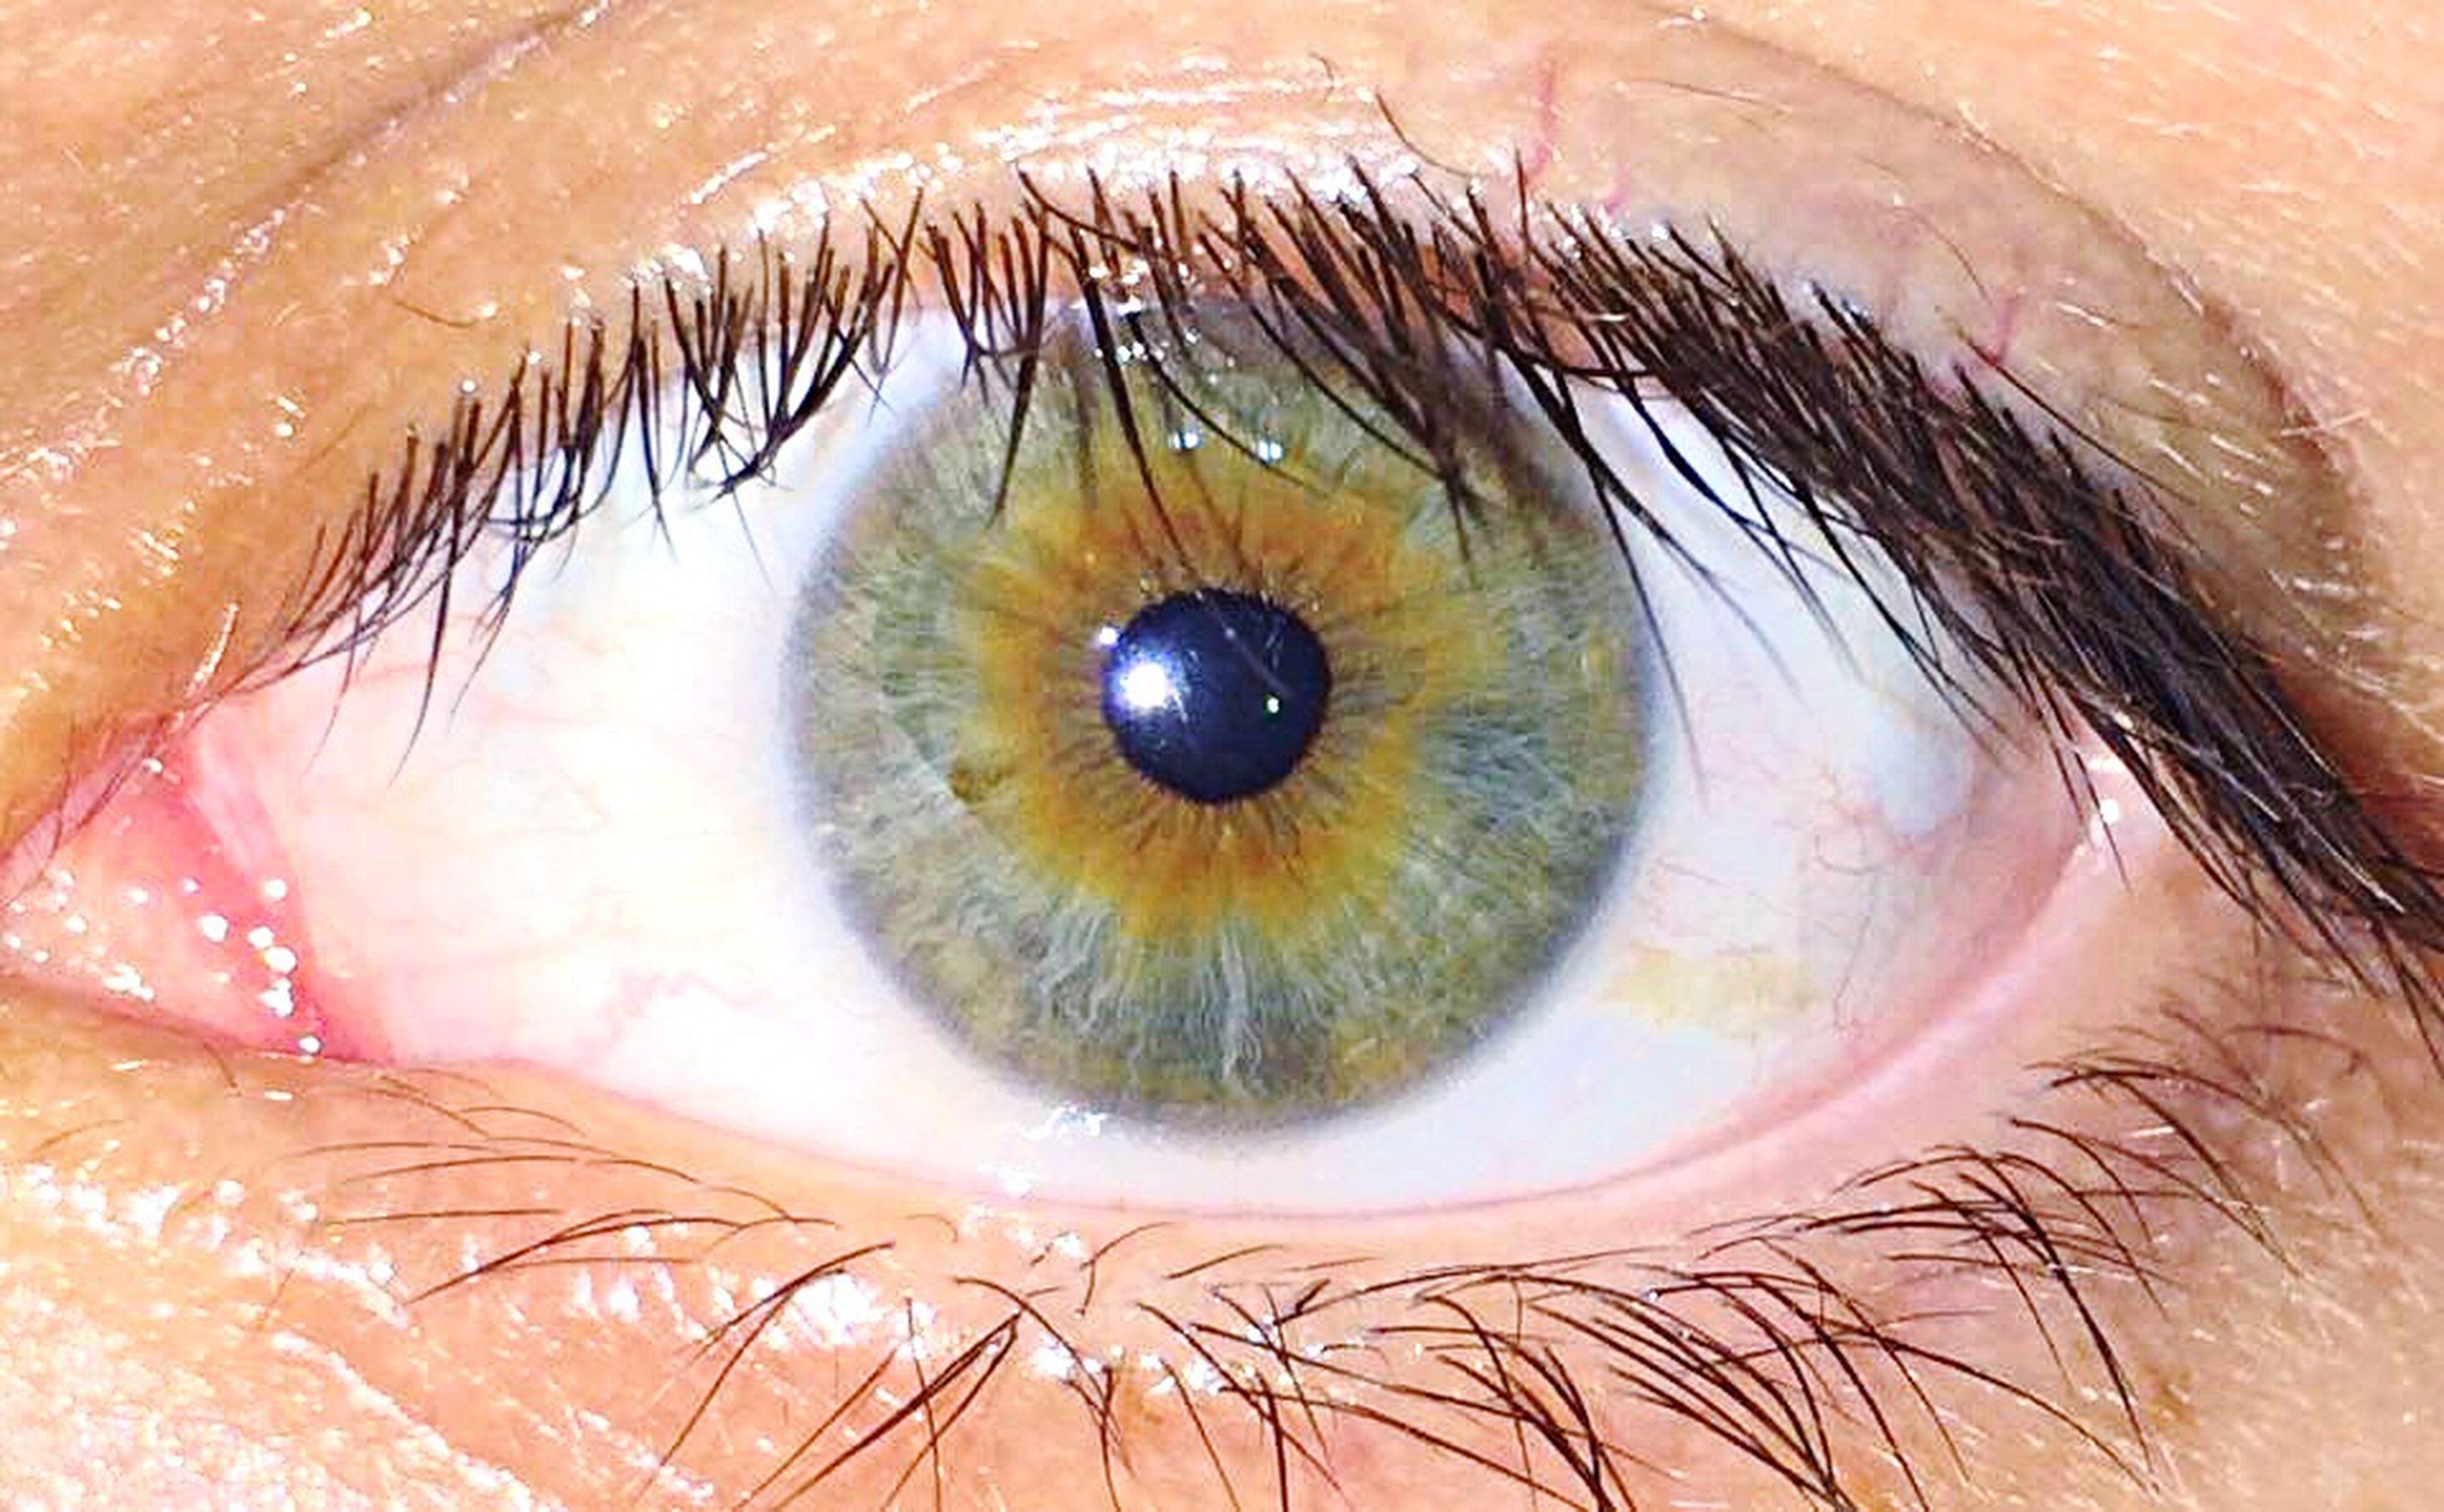 human eye, eyelash, full frame, eyesight, close-up, sensory perception, backgrounds, staring, extreme close-up, part of, person, looking at camera, extreme close up, beauty, eyeball, green eyes, make-up, human skin, iris - eye, focus on foreground, eyeshadow, eyebrow, vision